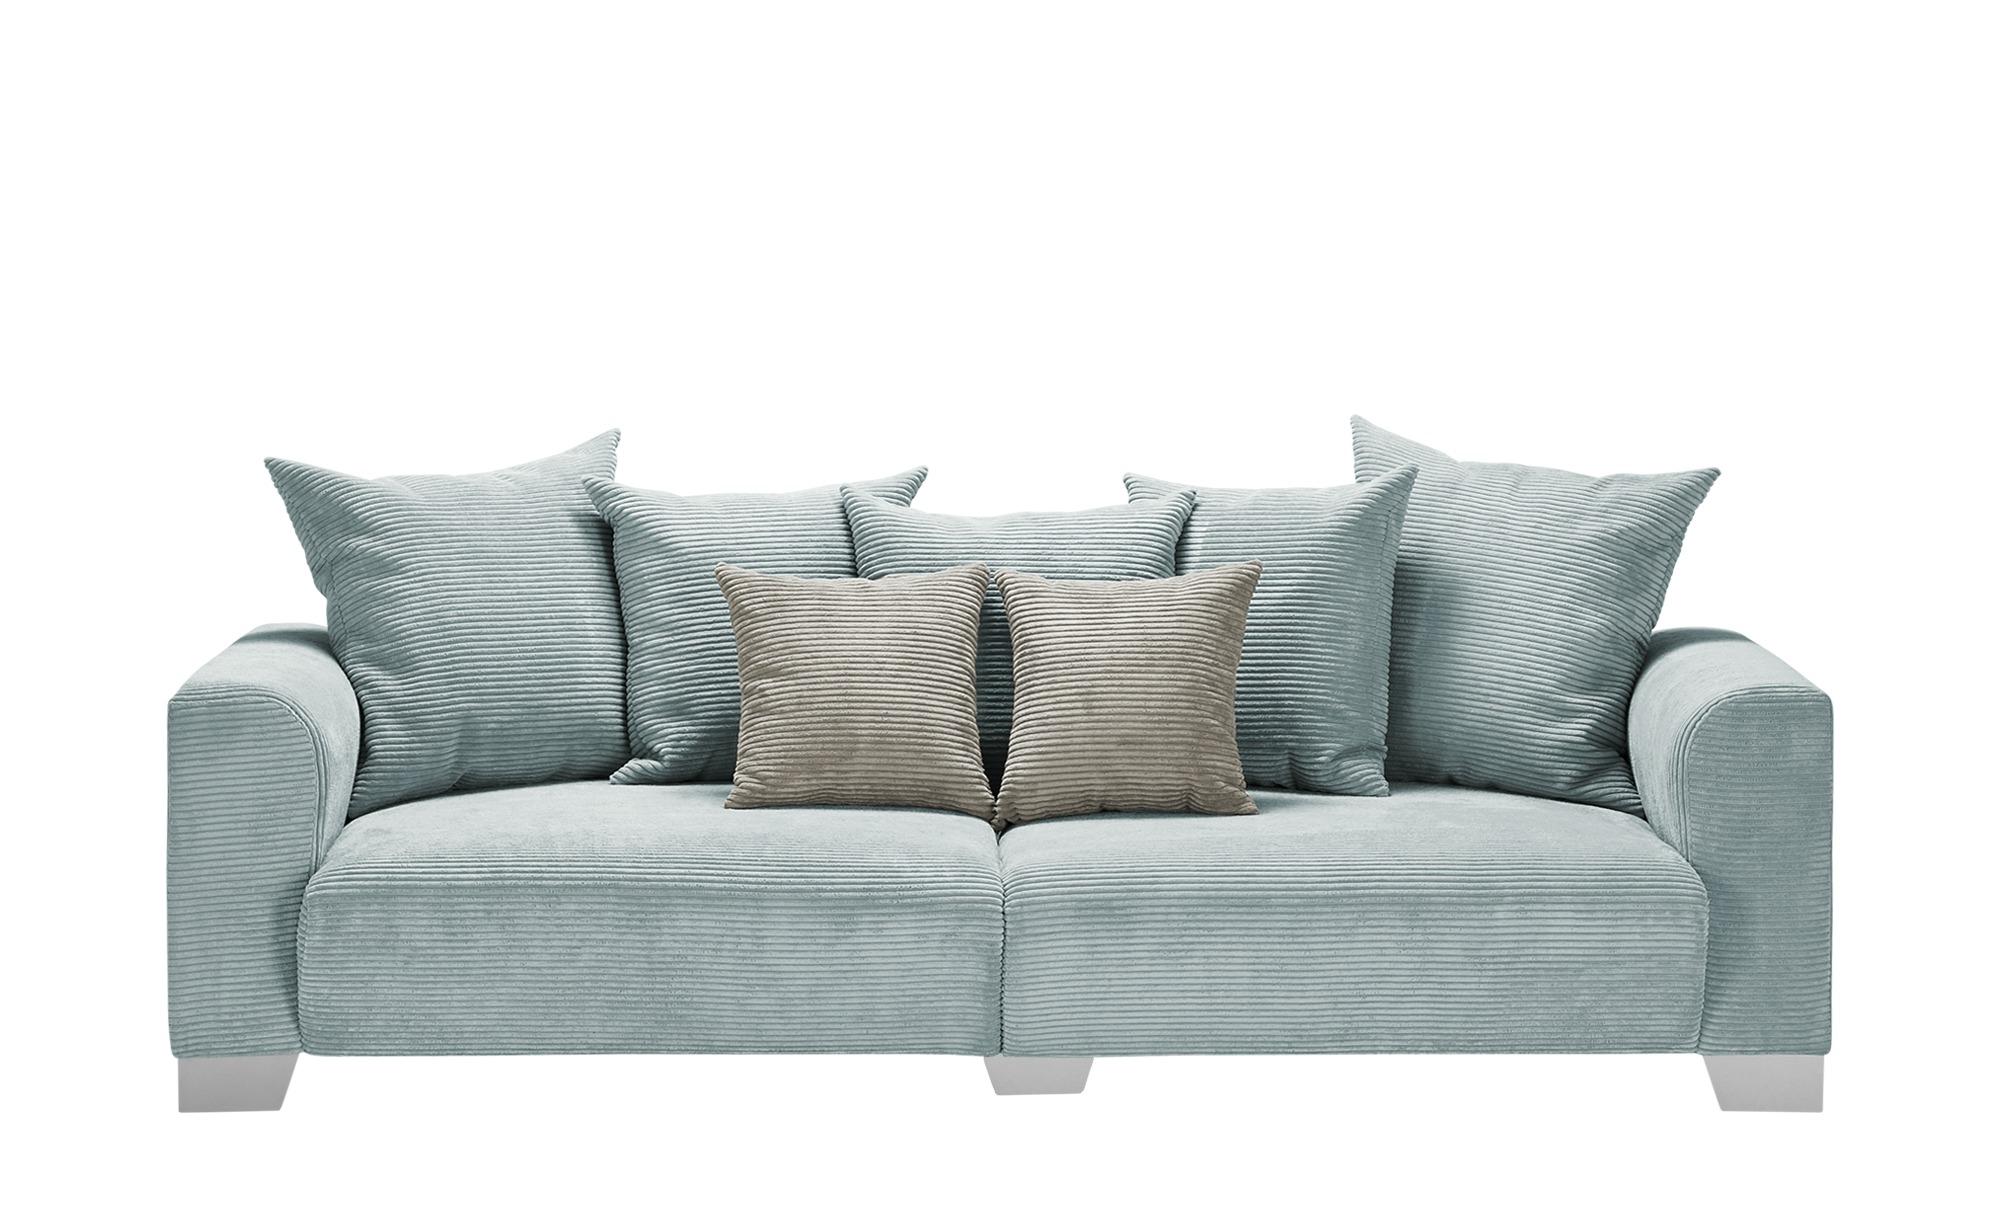 smart Big Sofa  Tonja ¦ grün ¦ Maße (cm): B: 244 H: 68 T: 107 Polstermöbel > Sofas > Big-Sofas - Höffner